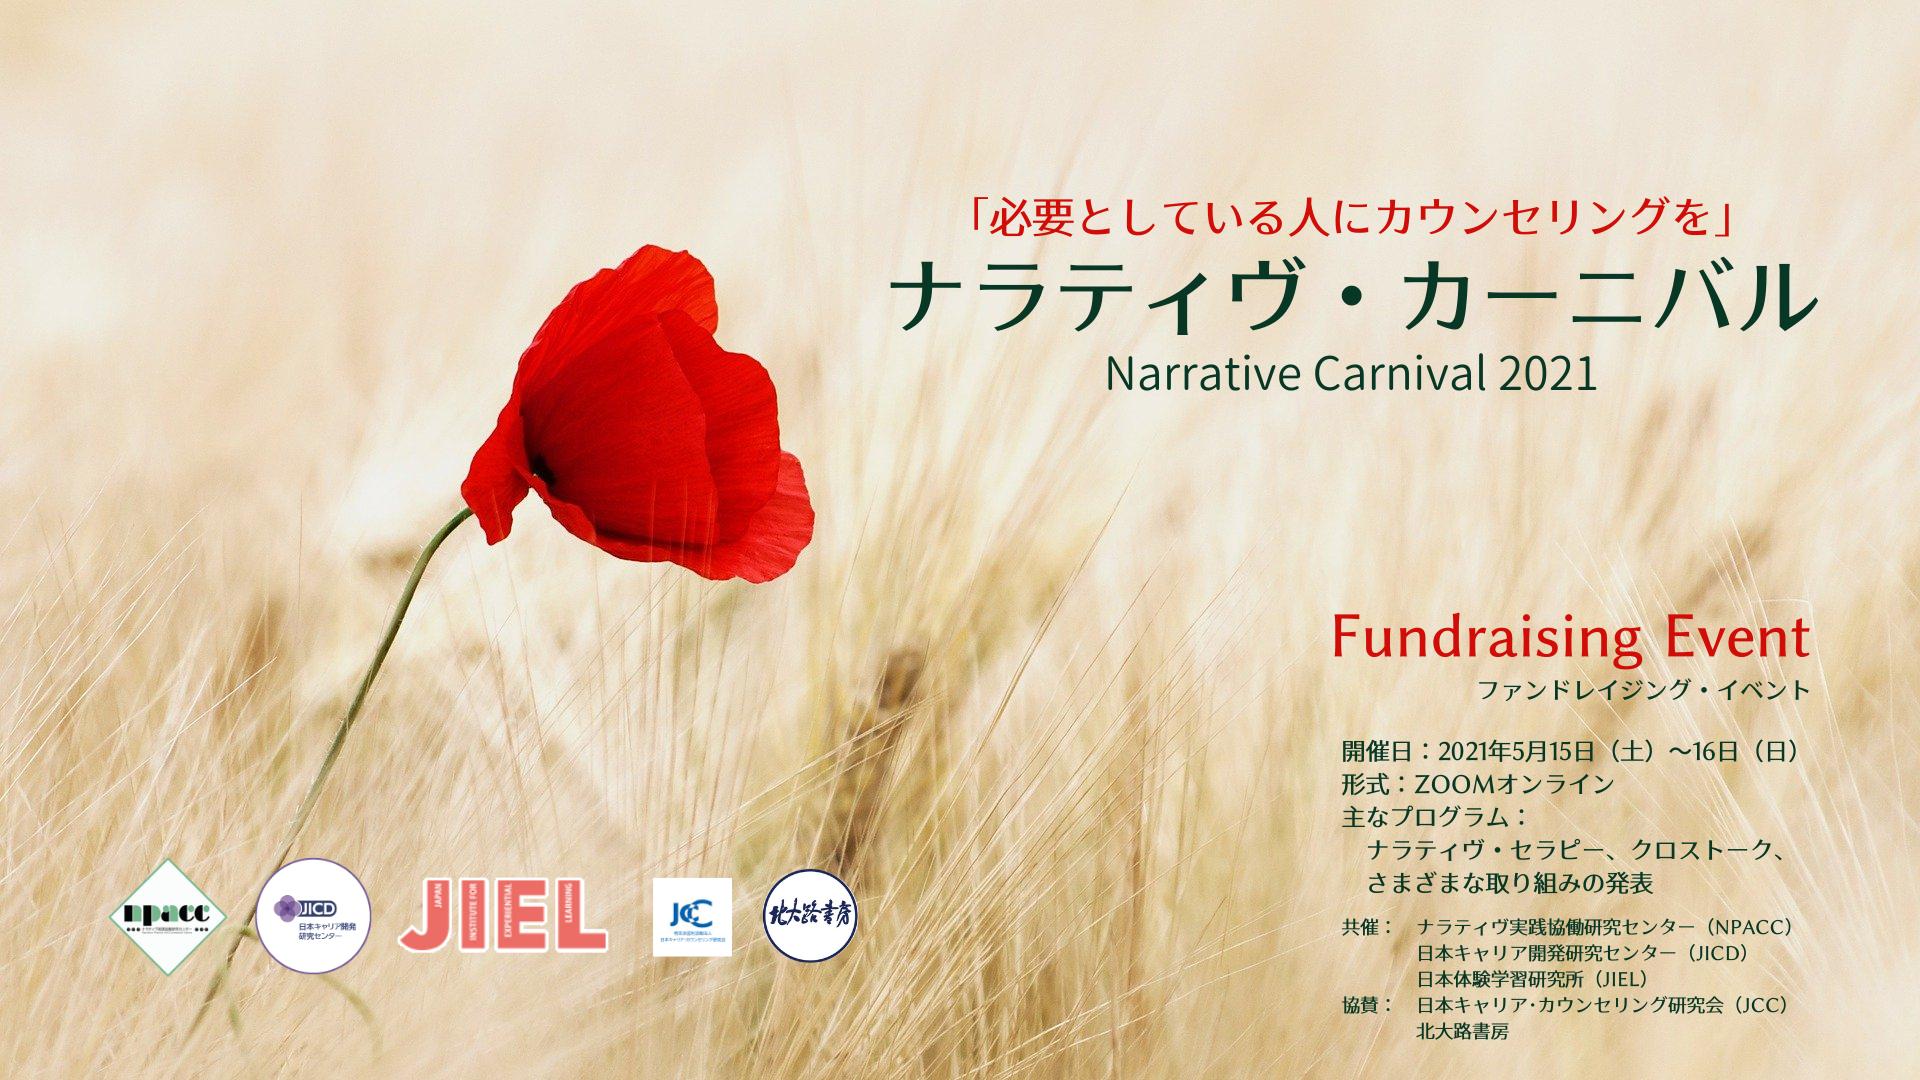 Fundraising Narrative Carnival 2021(1)